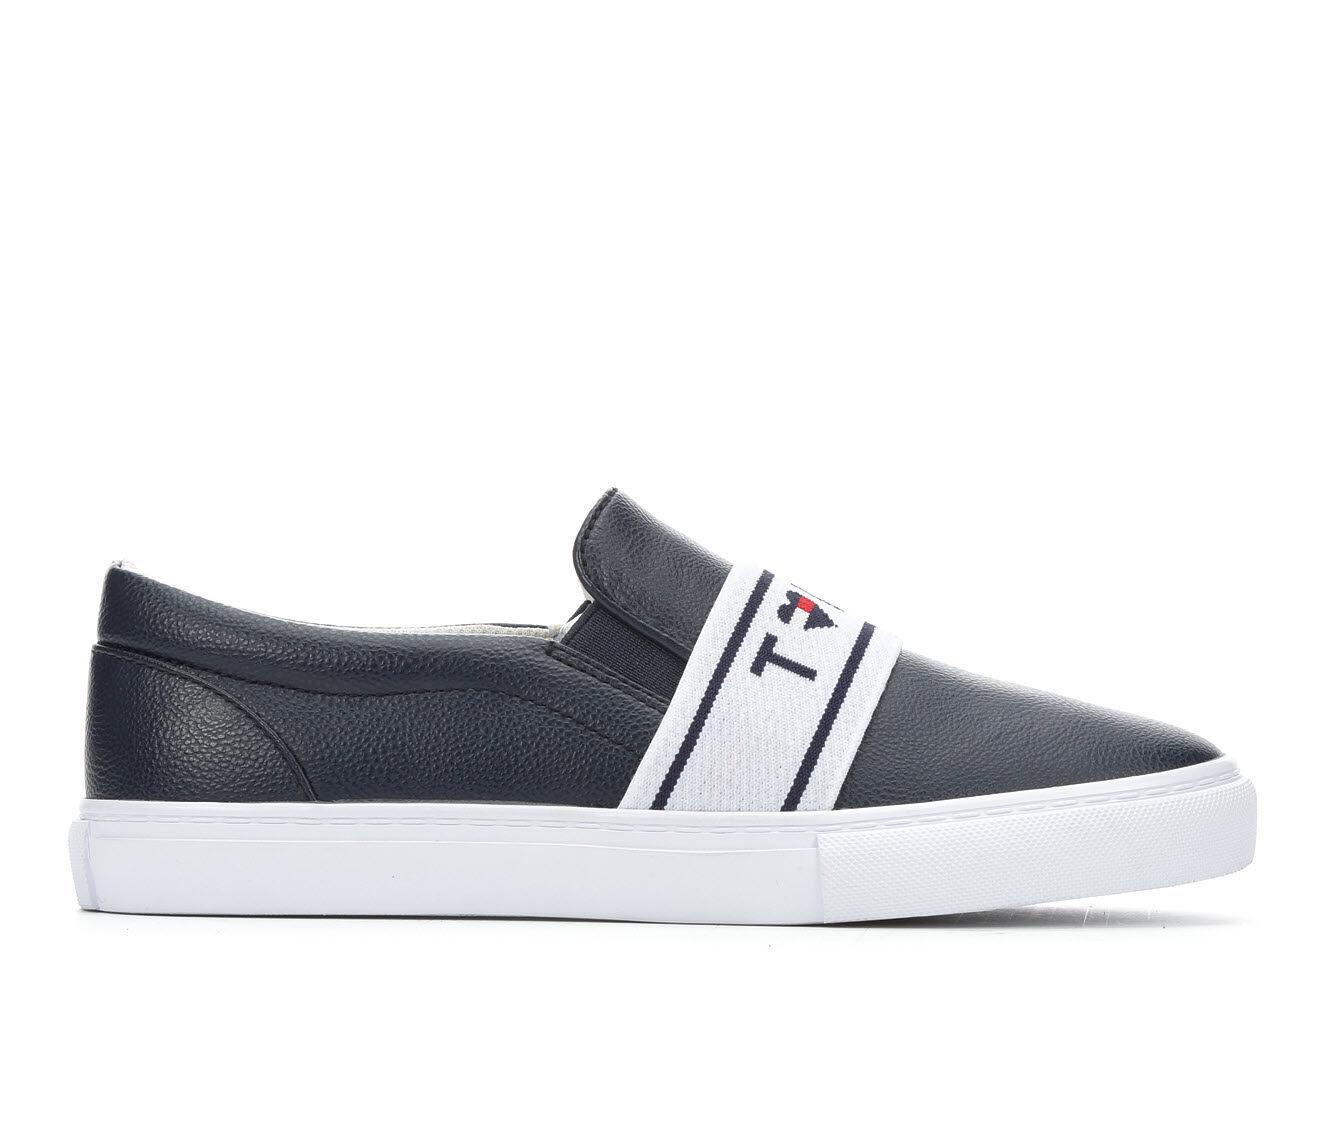 Women's Tommy Hilfiger Lourena Sneakers Blue/White Mult